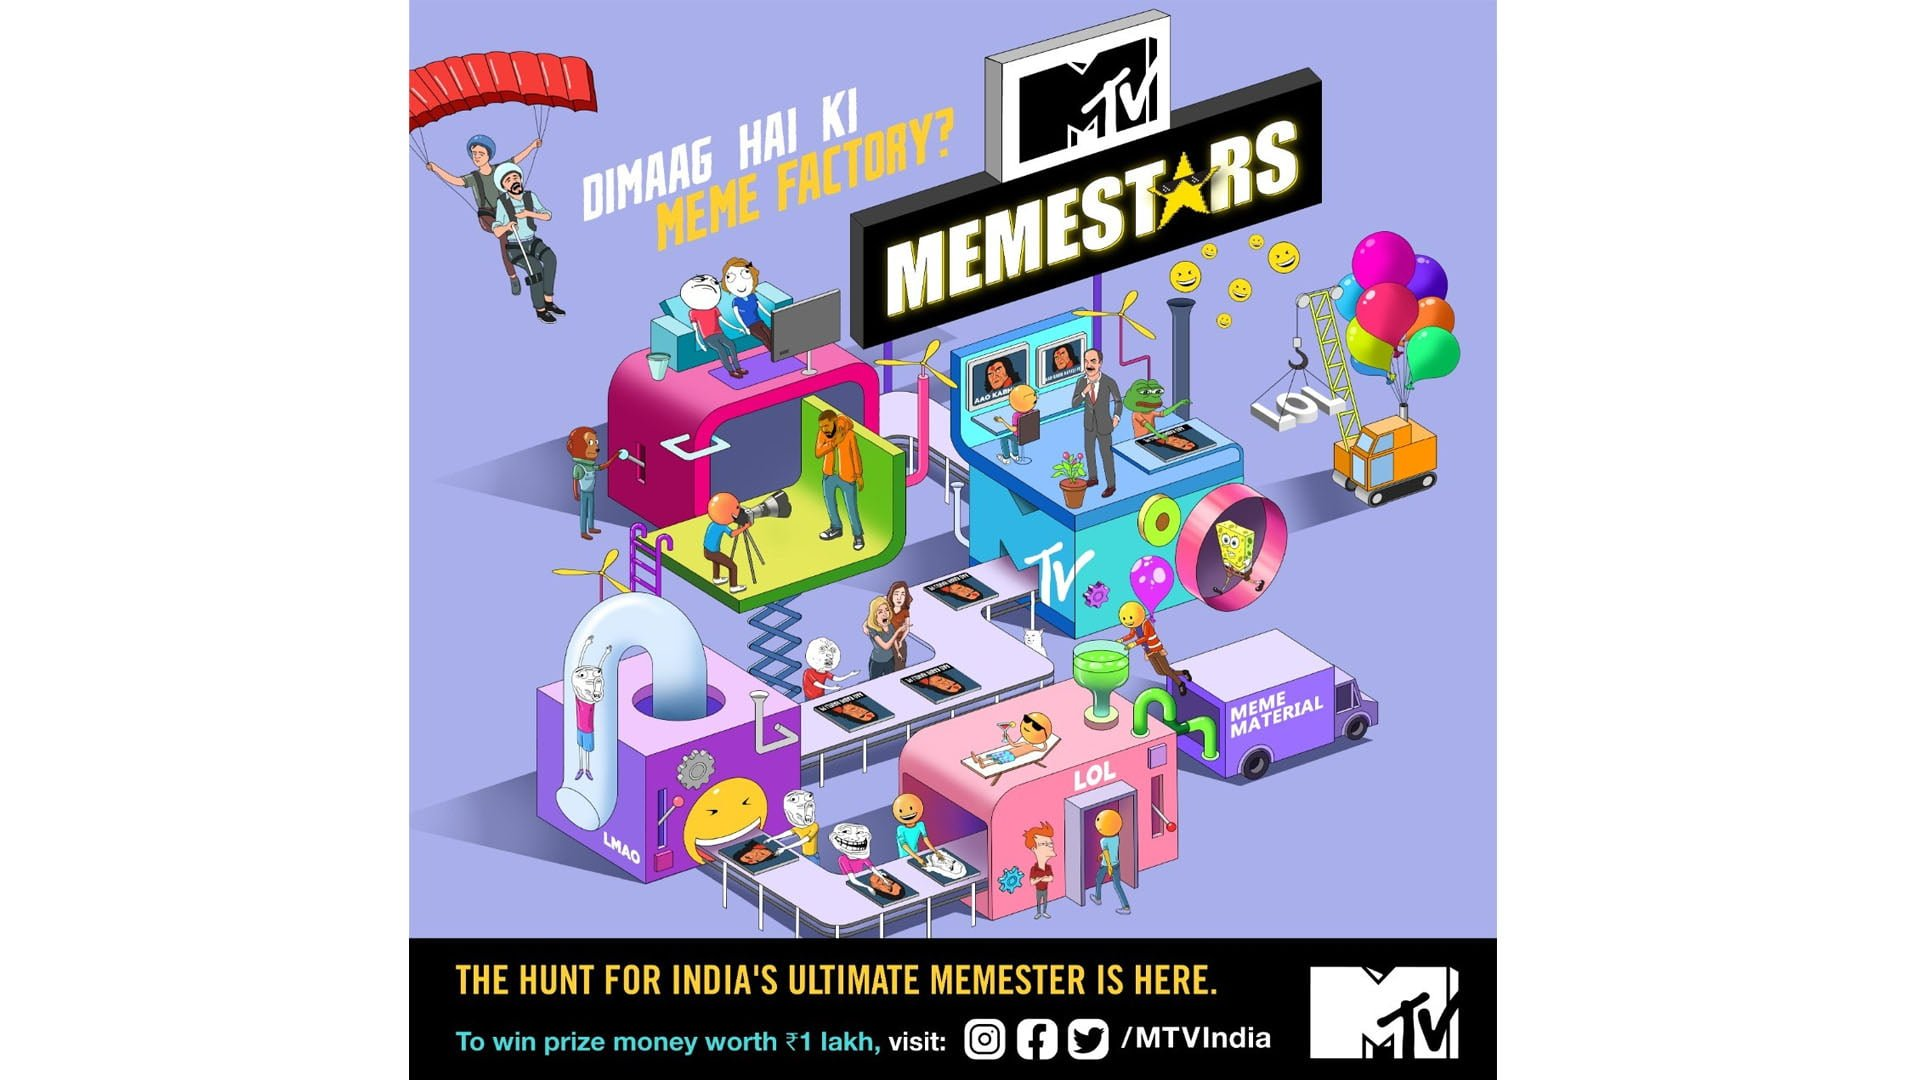 MTV Meme Stars